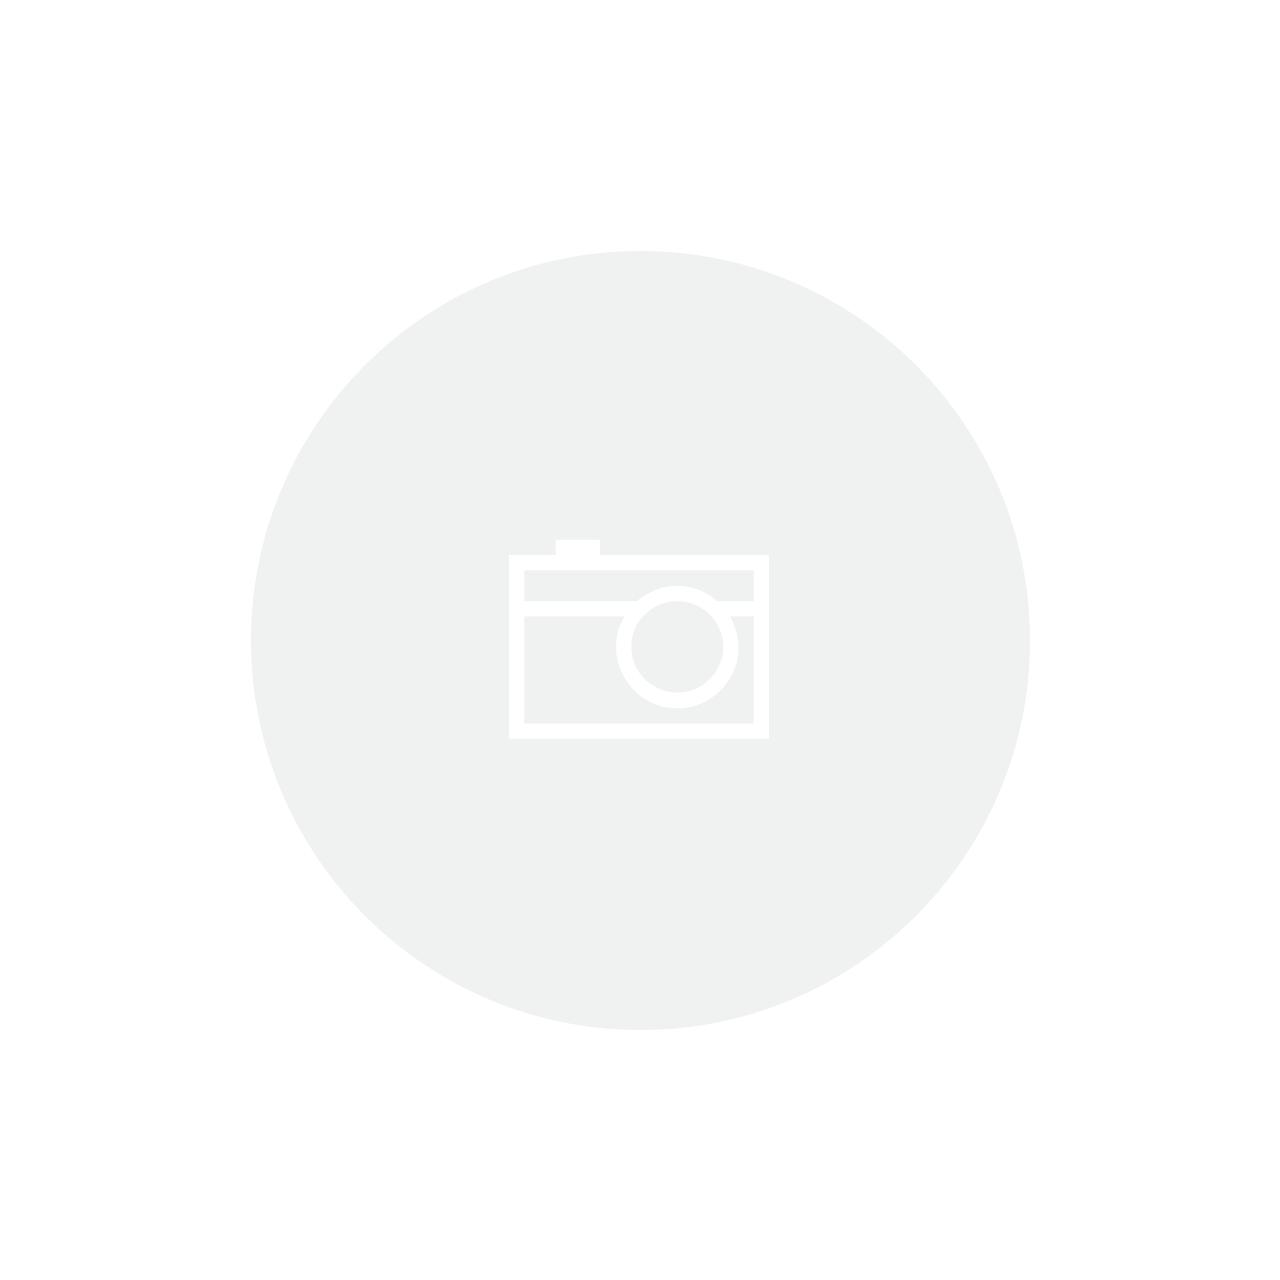 Fervedor Inox 12Cm 1,40 Litros Allegra Tramontina